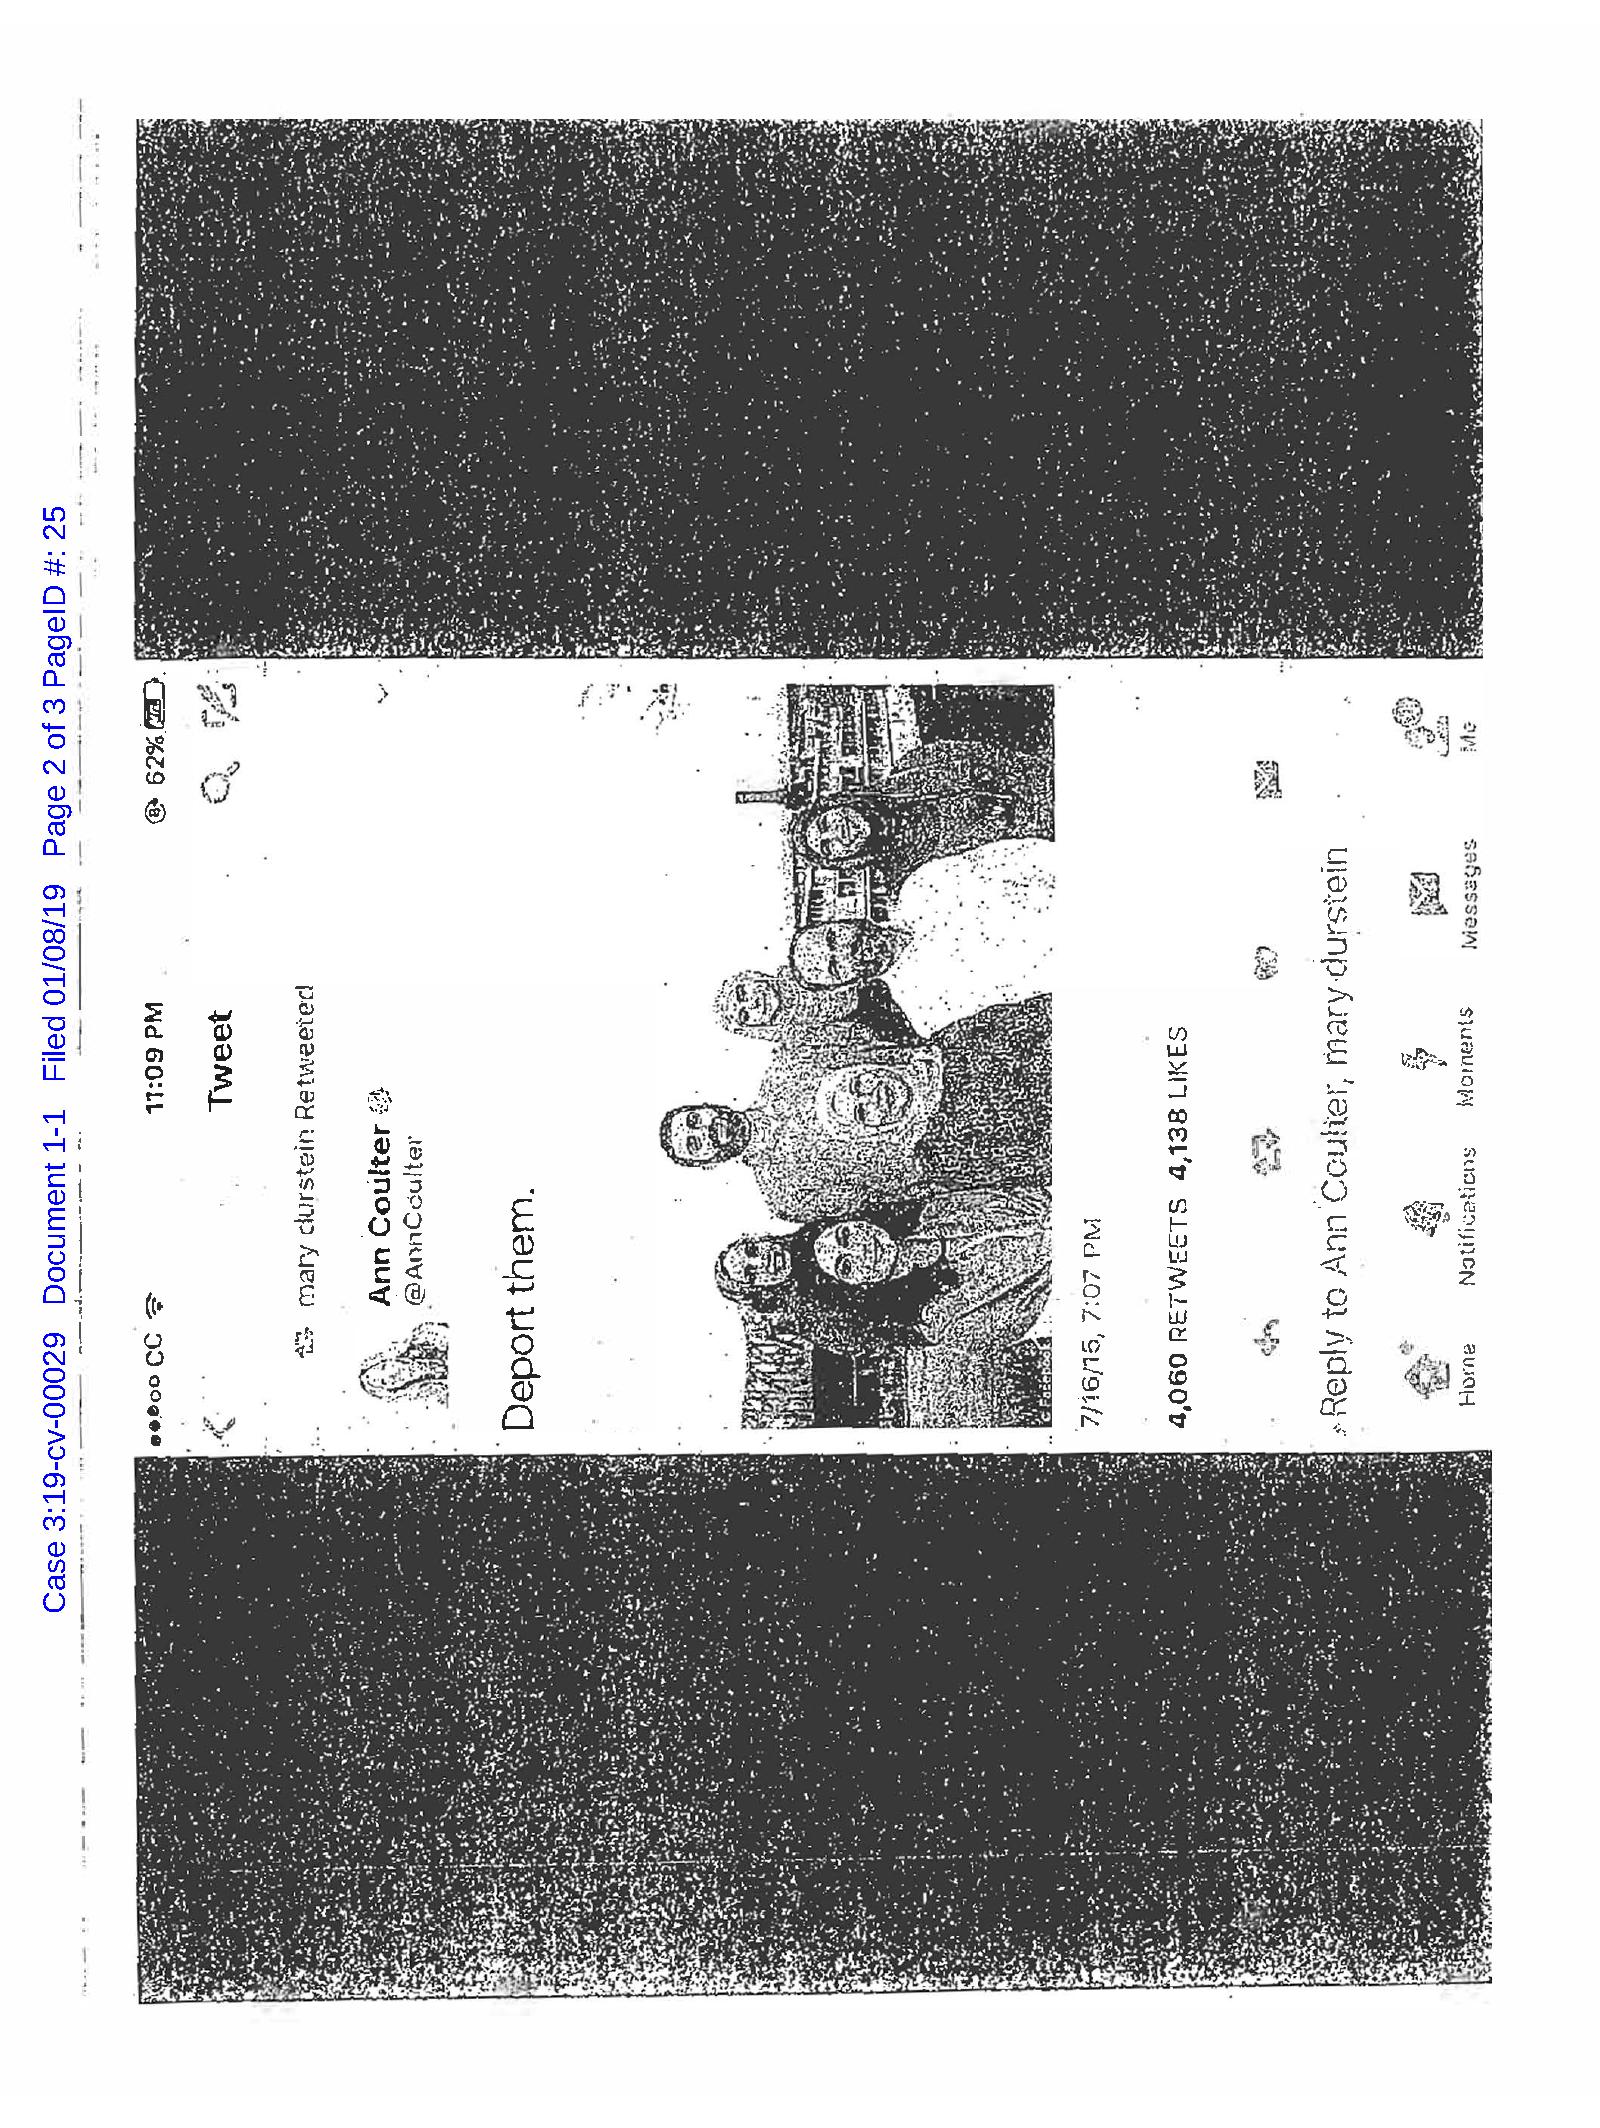 Copy of 2021-03-28_1-47-032.png